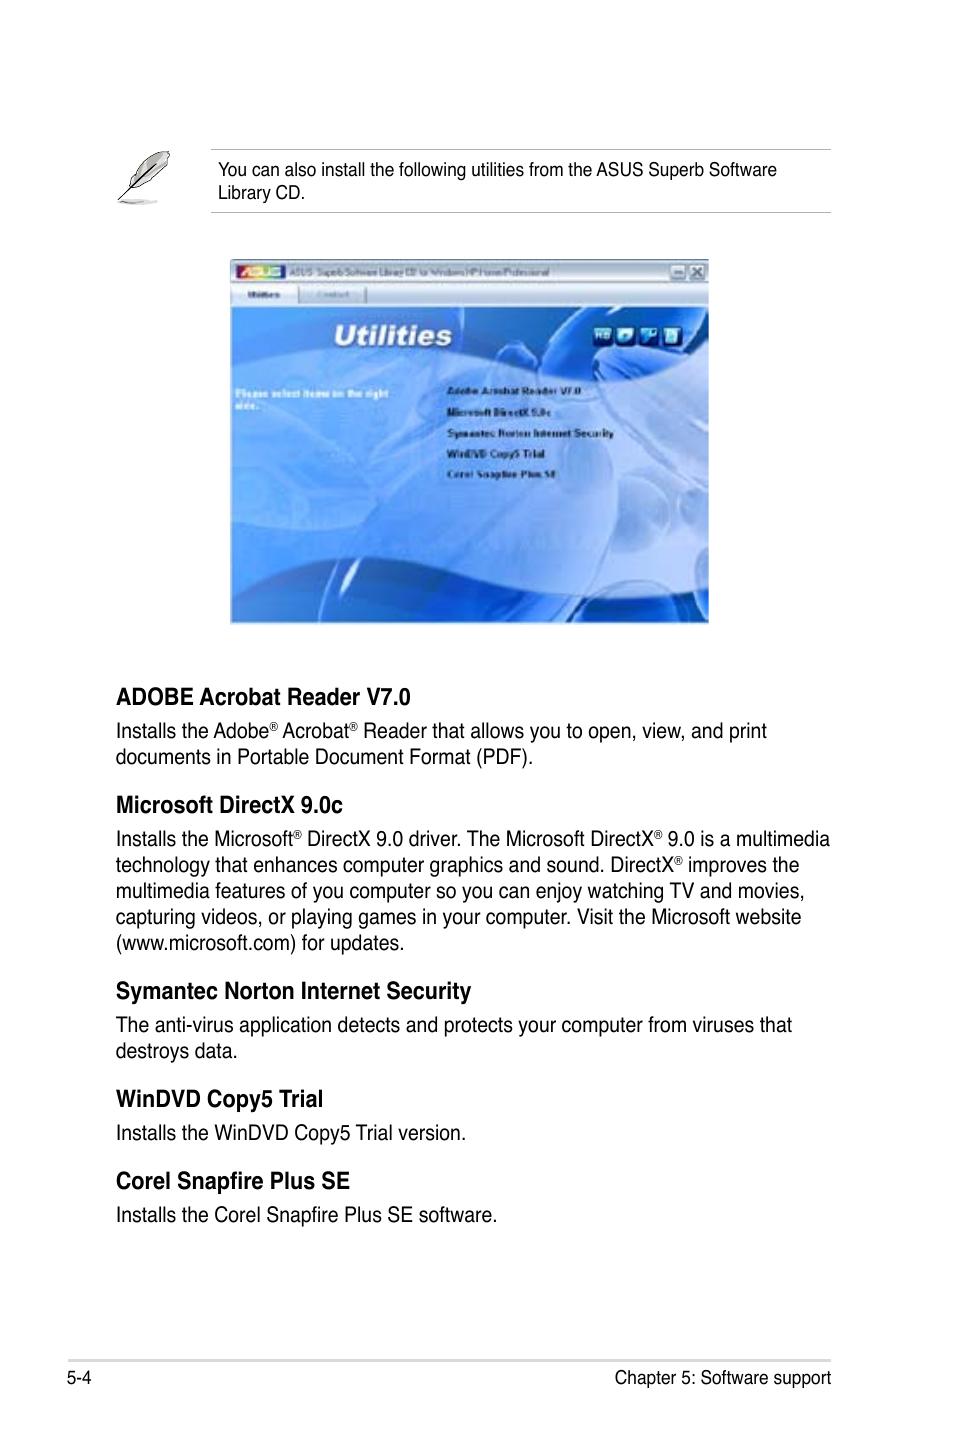 adobe acrobat reader v7 0 microsoft directx 9 0c symantec norton rh manualsdir com Adobe Acrobat Logo Adobe InDesign